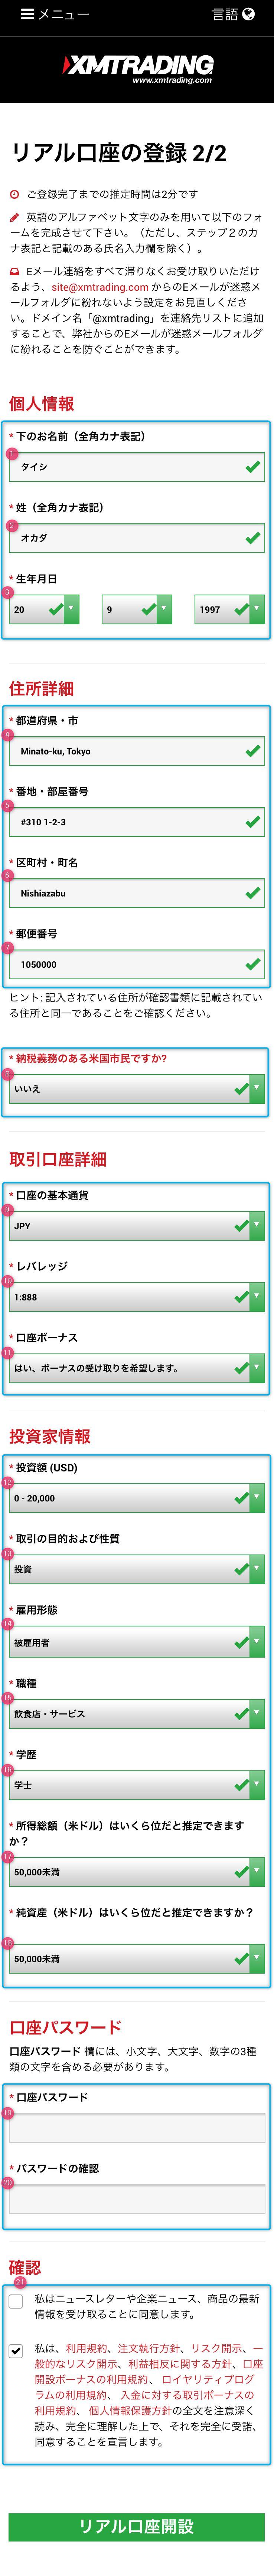 XM-口座開設スマホ公式2/2